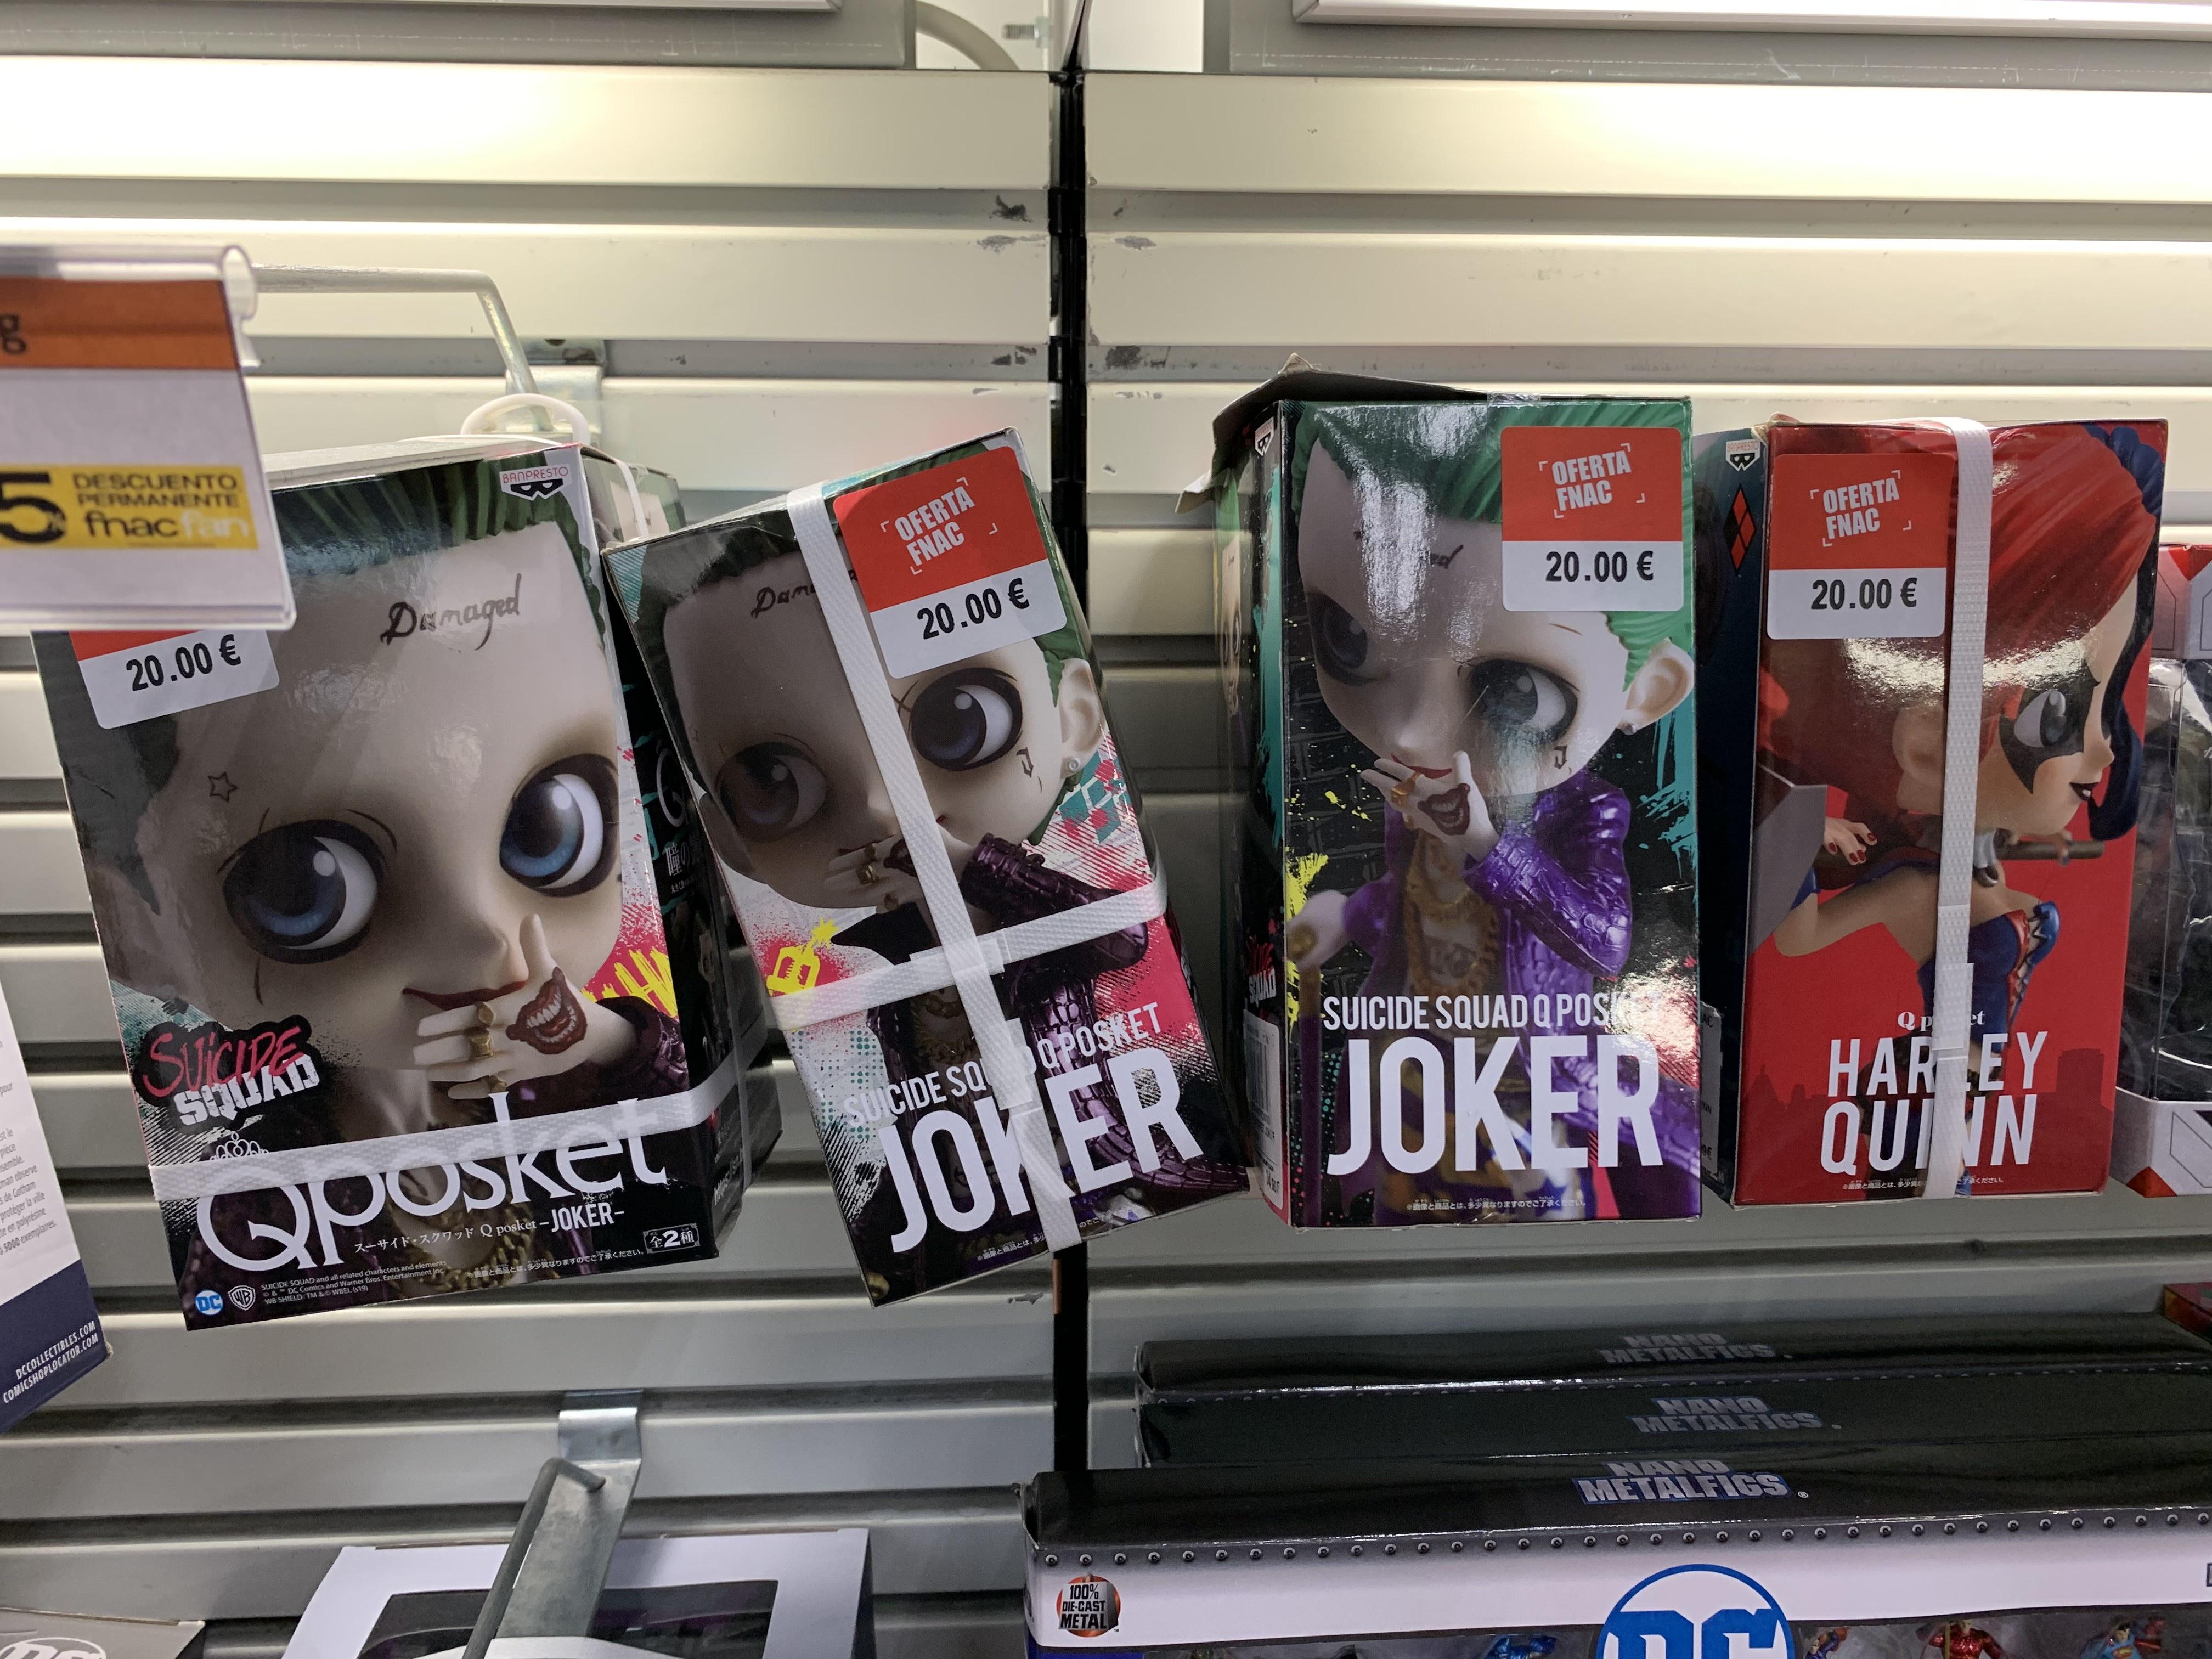 Qposket Joker o Harley Quinn (Fnac Murcia)